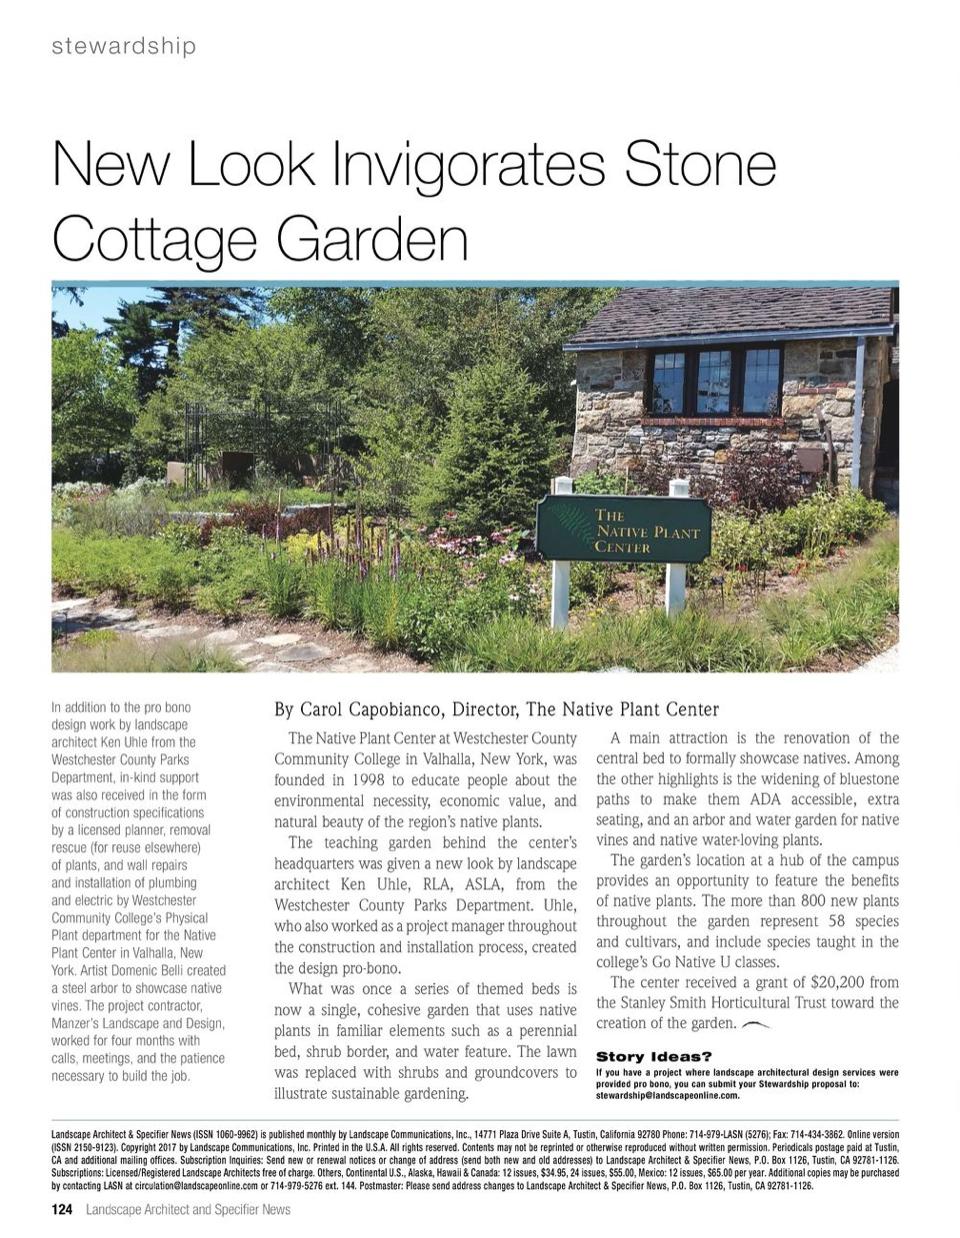 Landscape Architect and Specifier News Magazine